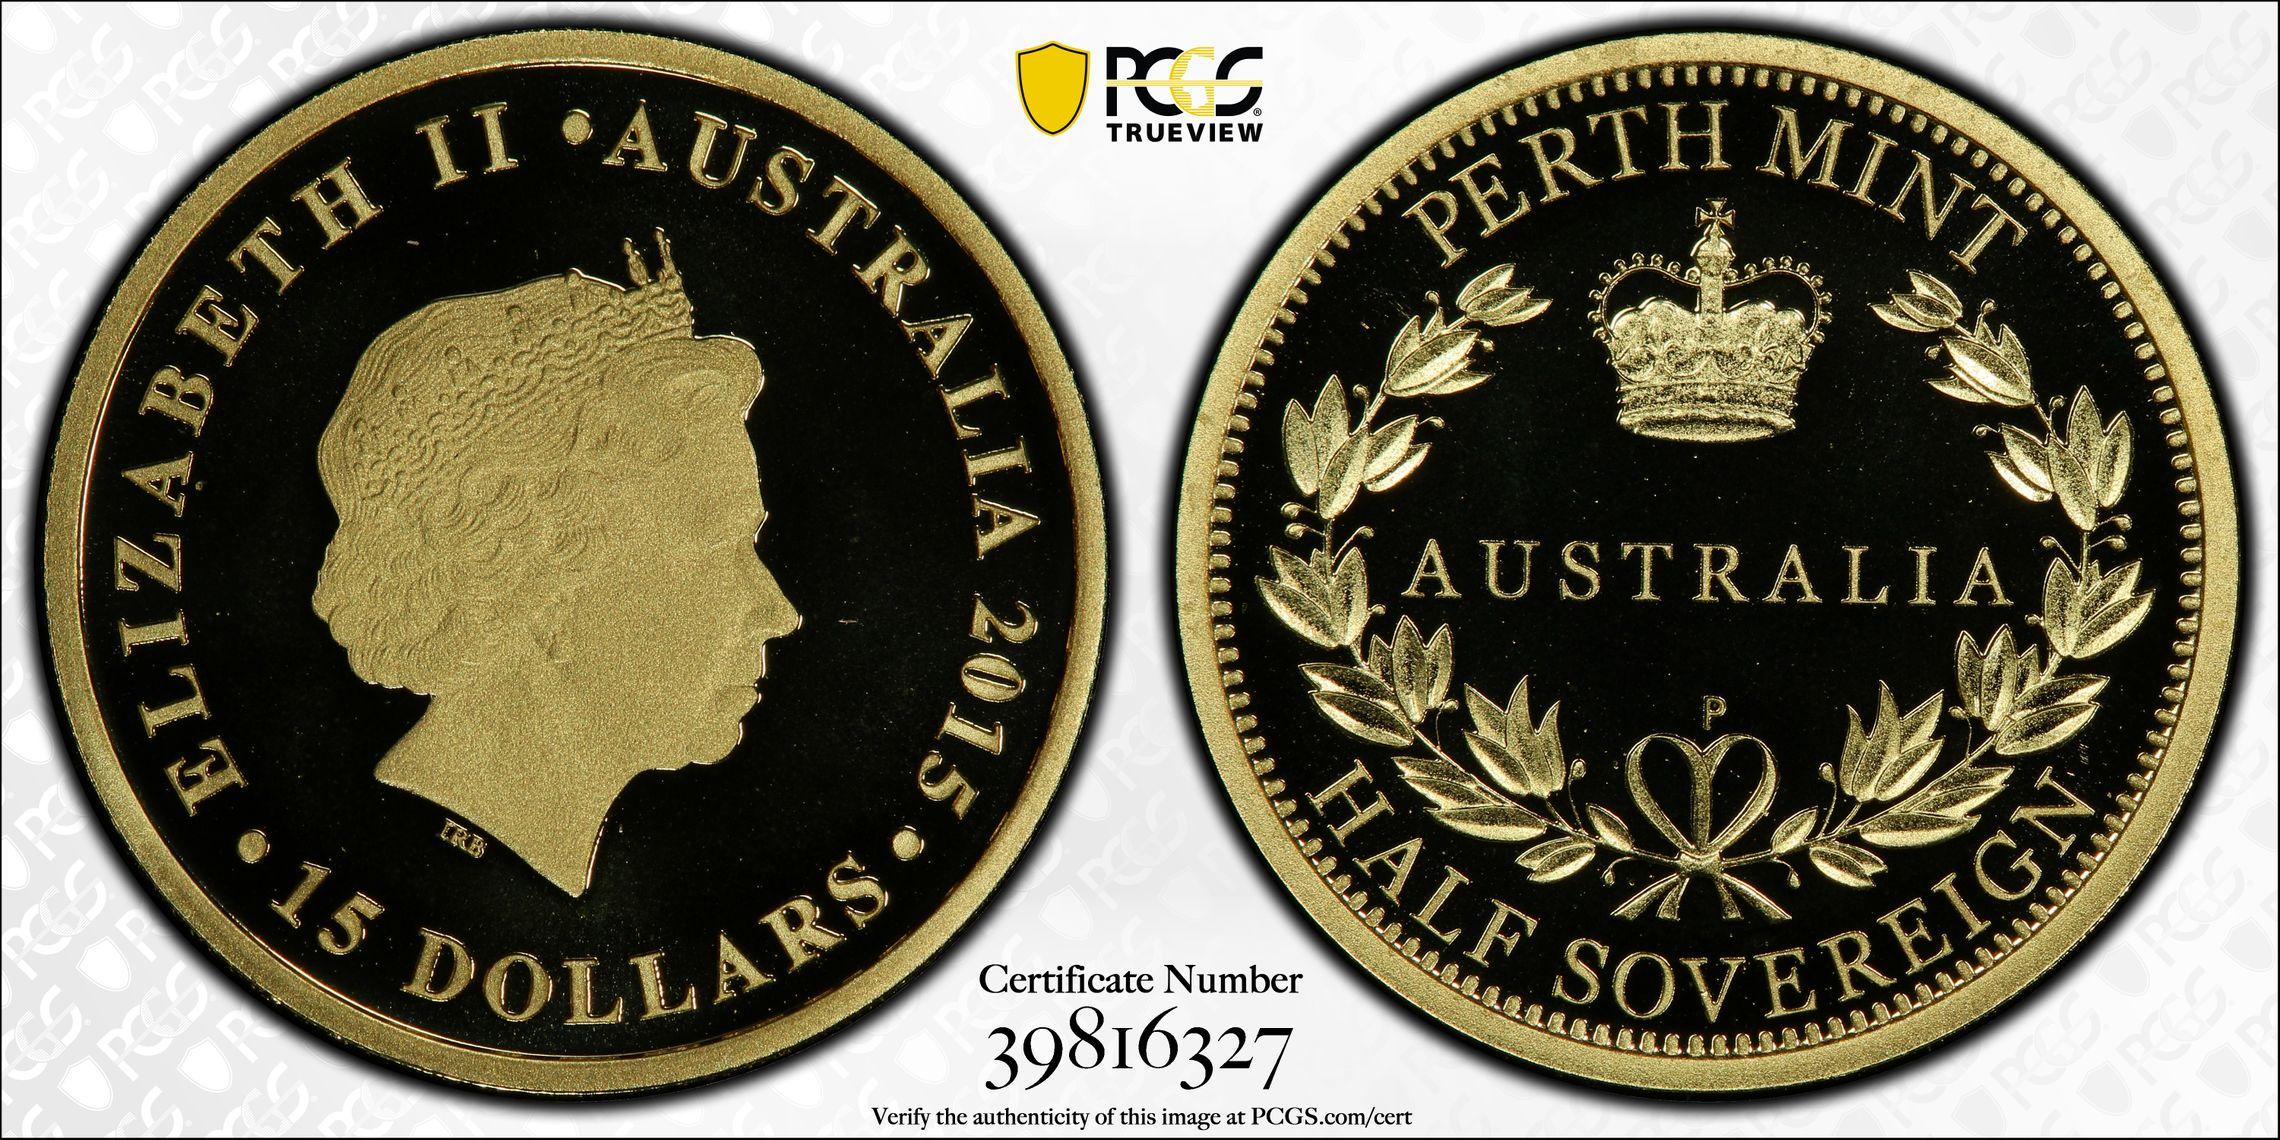 Australia 2015 Perth Half Sovereign - PCGS PR70